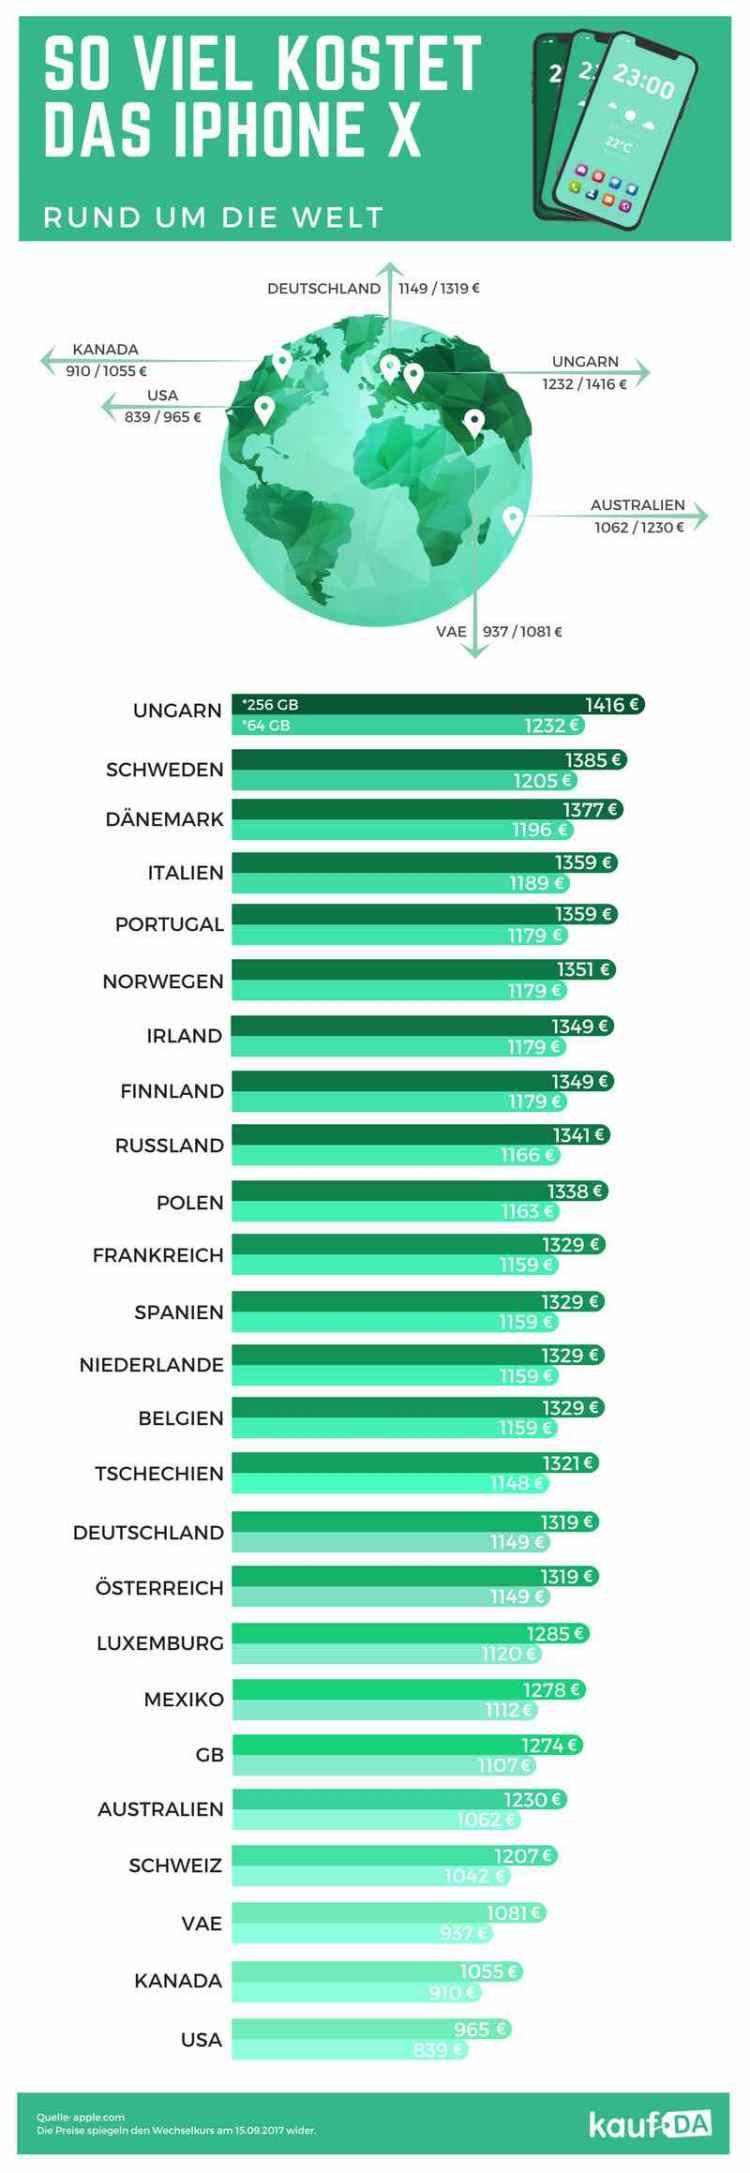 iPhone X Infografik Preise weltweit